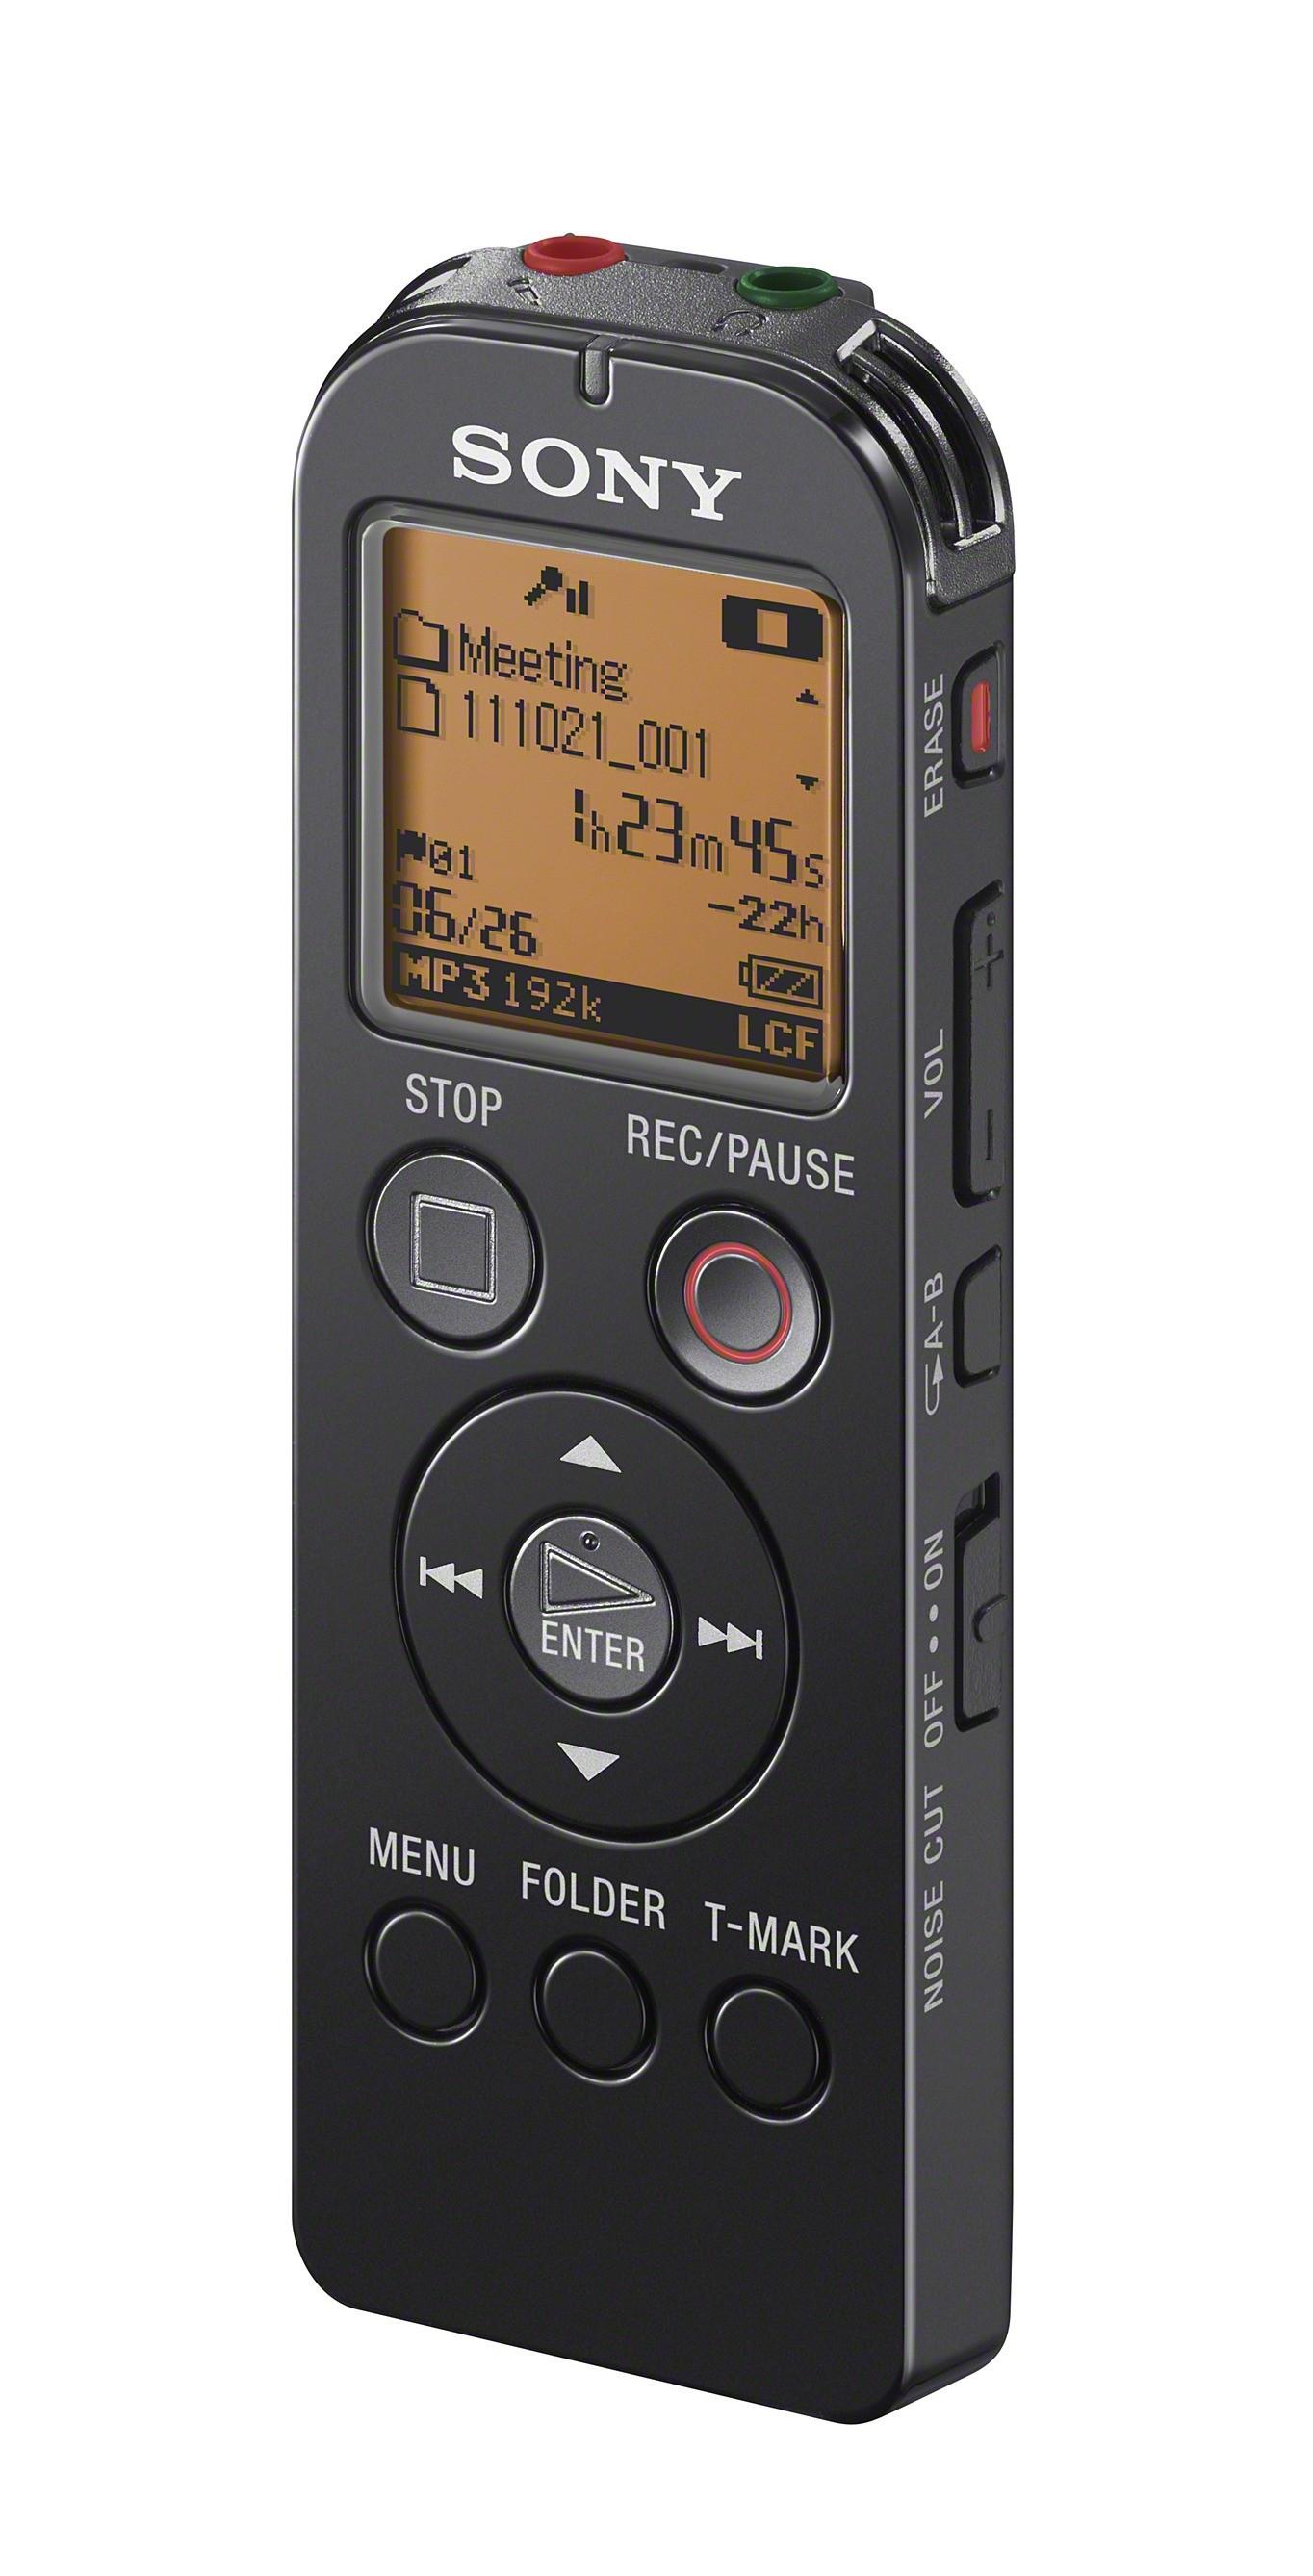 Sony ICD-UX523FW diktafon Sort